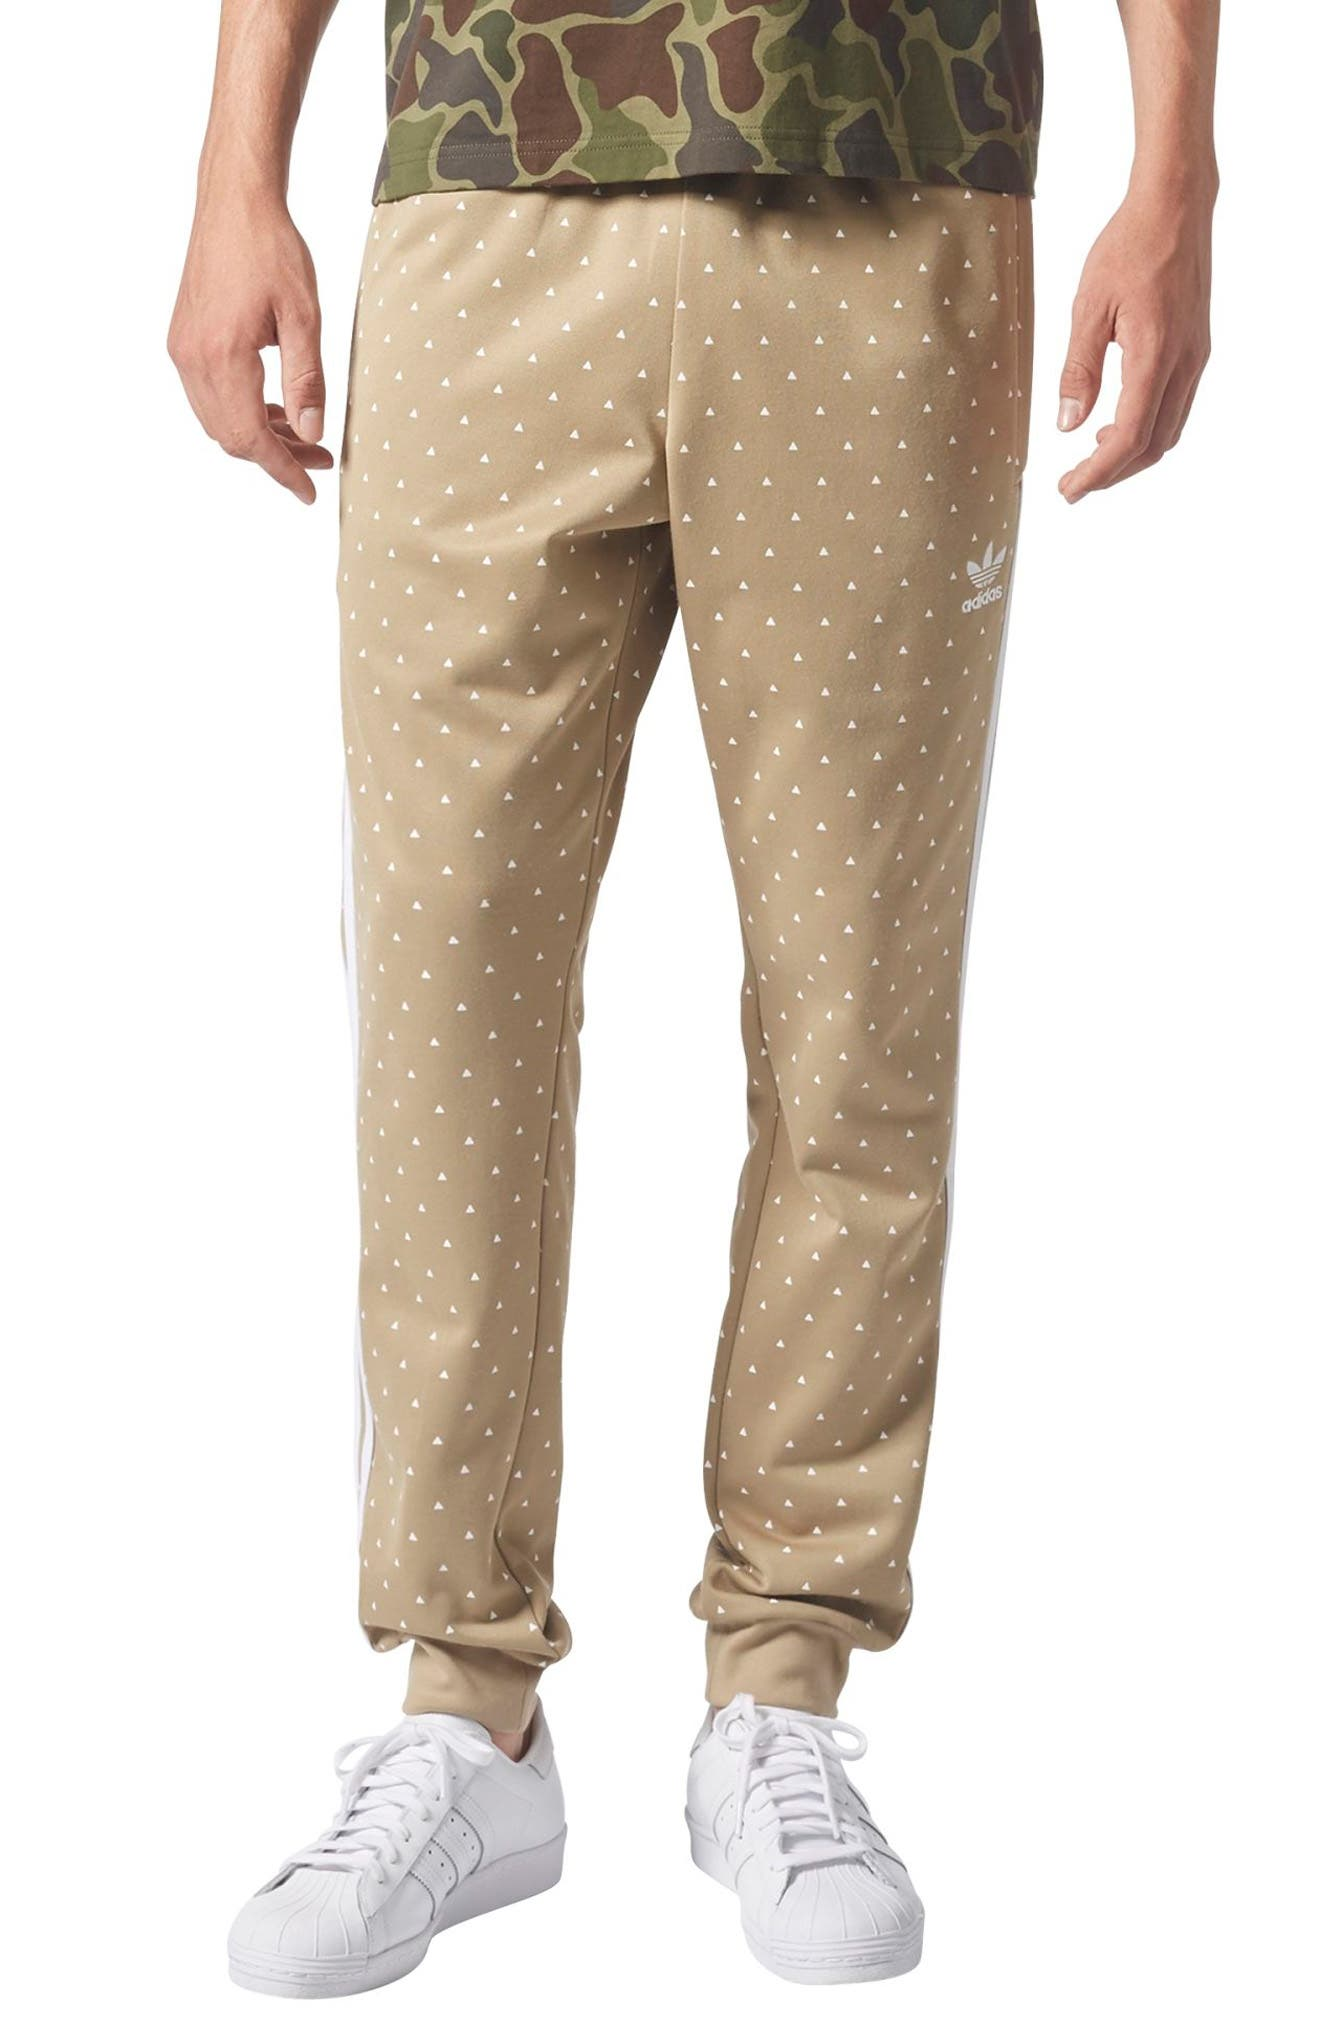 adidas Originals Pharrell Williams Hu Hiking SST Track Pants